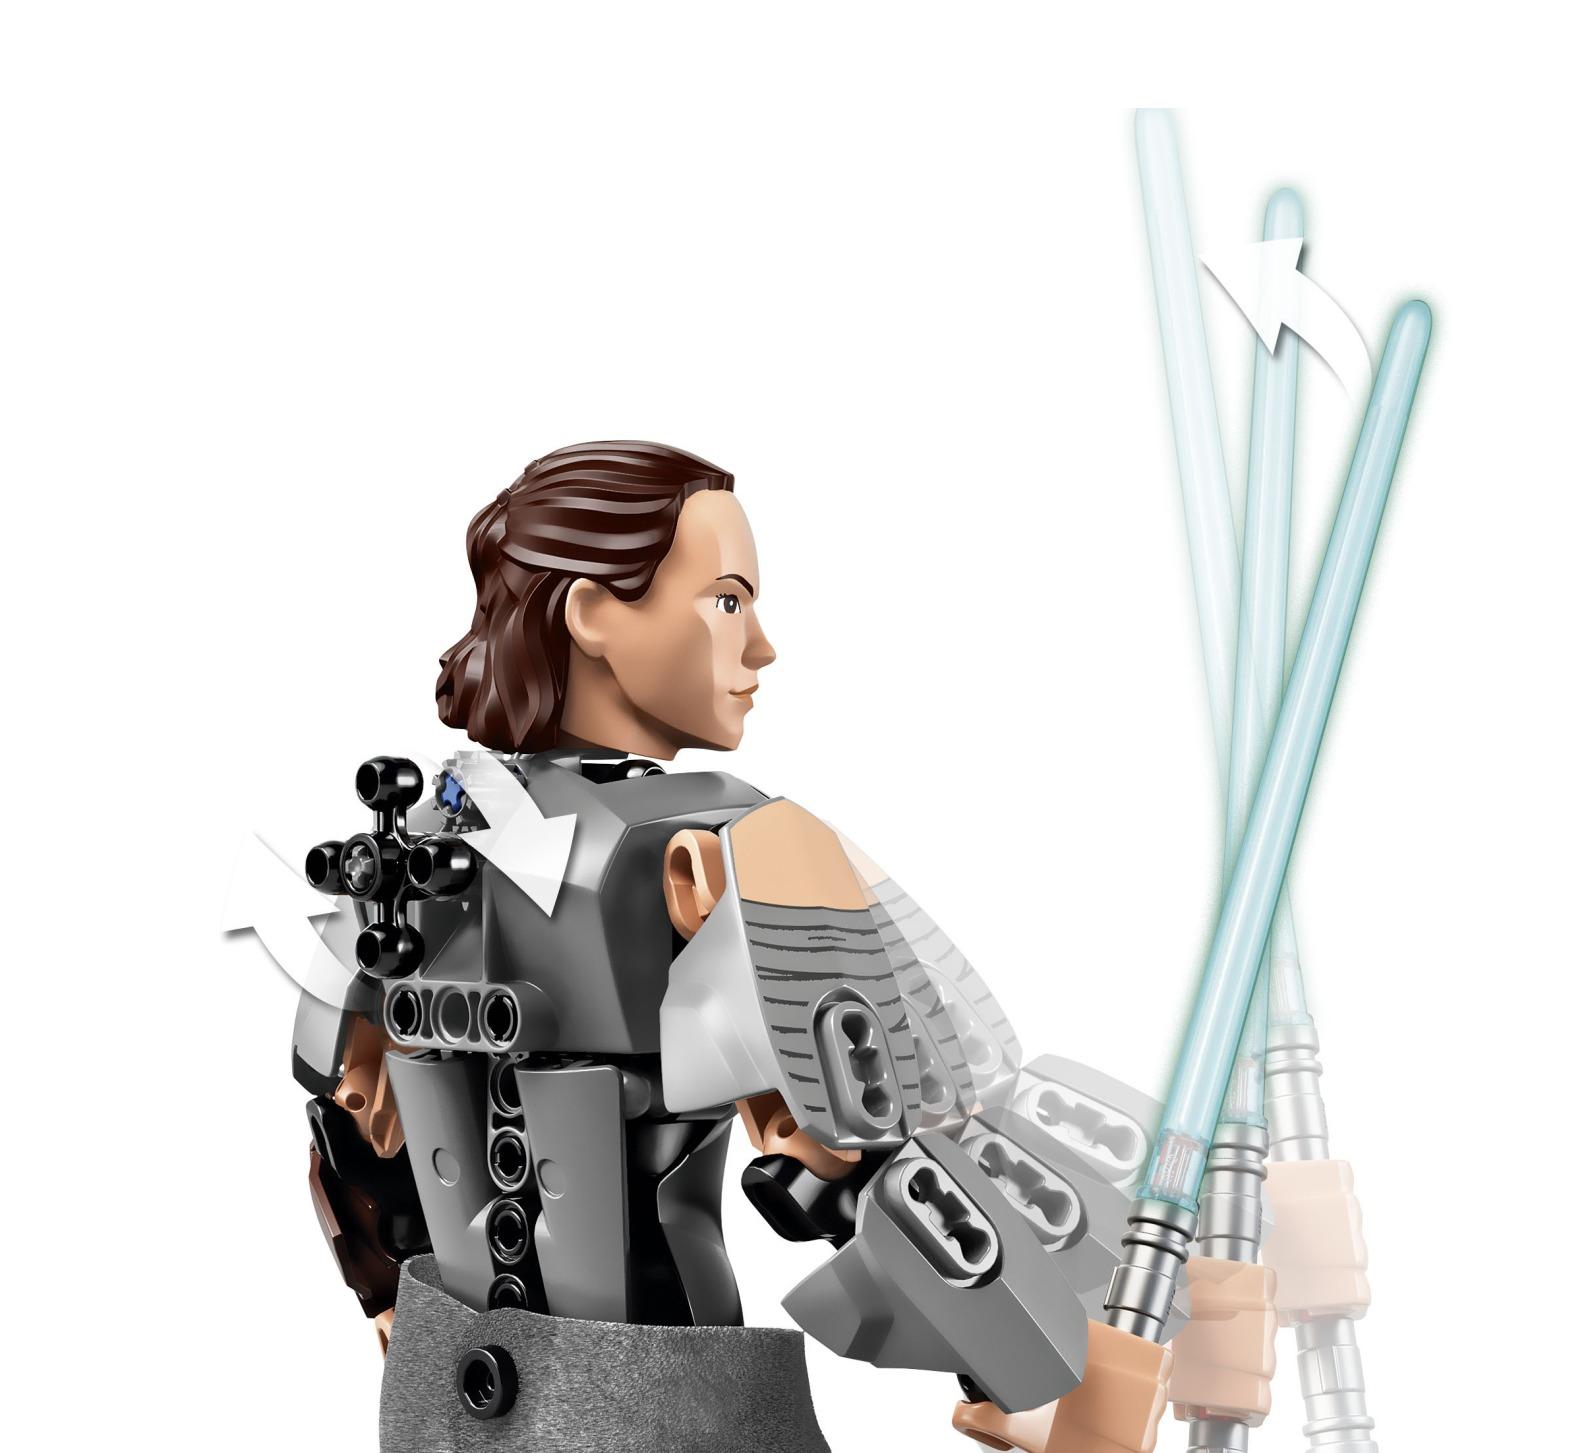 LEGO Star Wars - Rey (75528) image